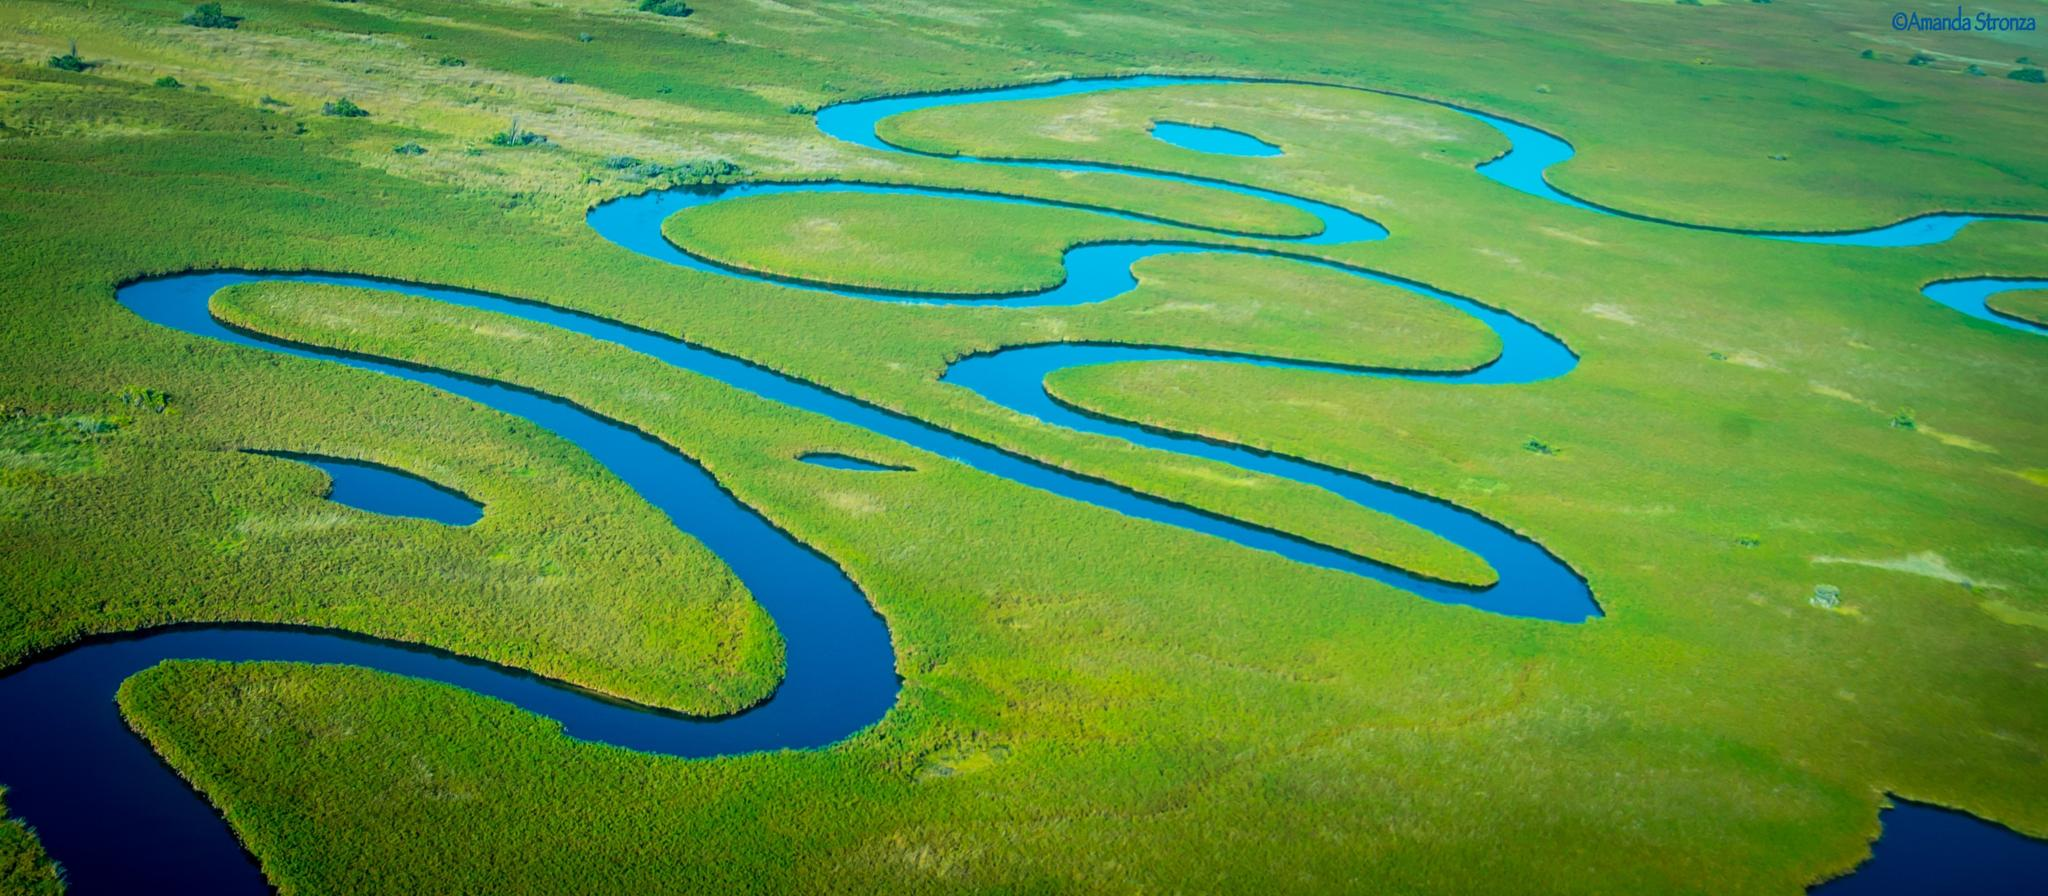 Okavango Blue by amanda.stronza